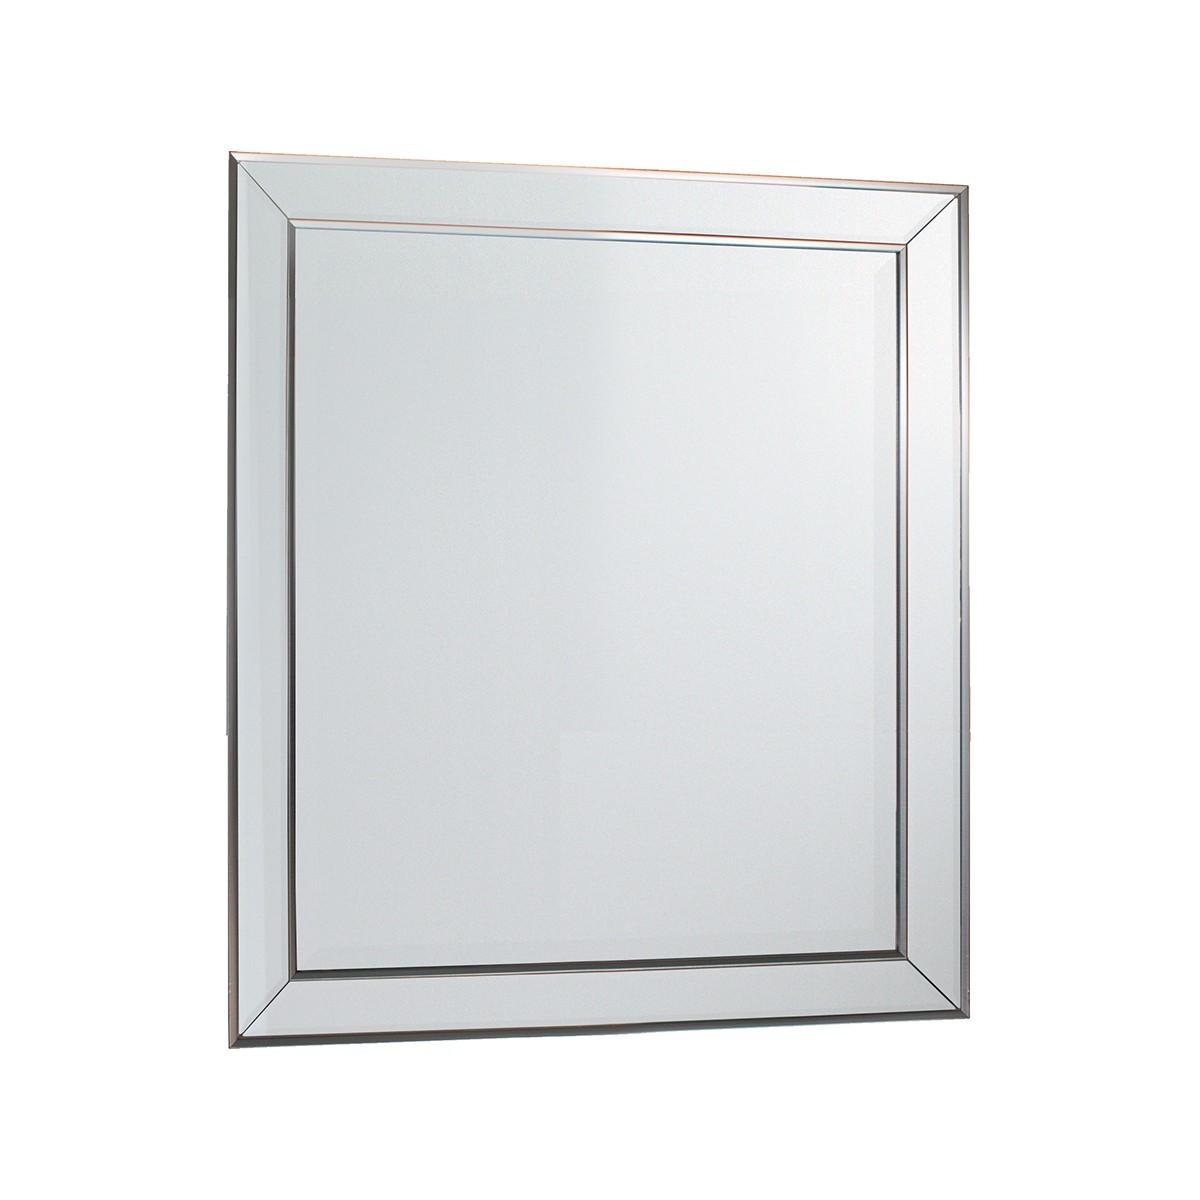 Heather Wall Mirror, 70cm